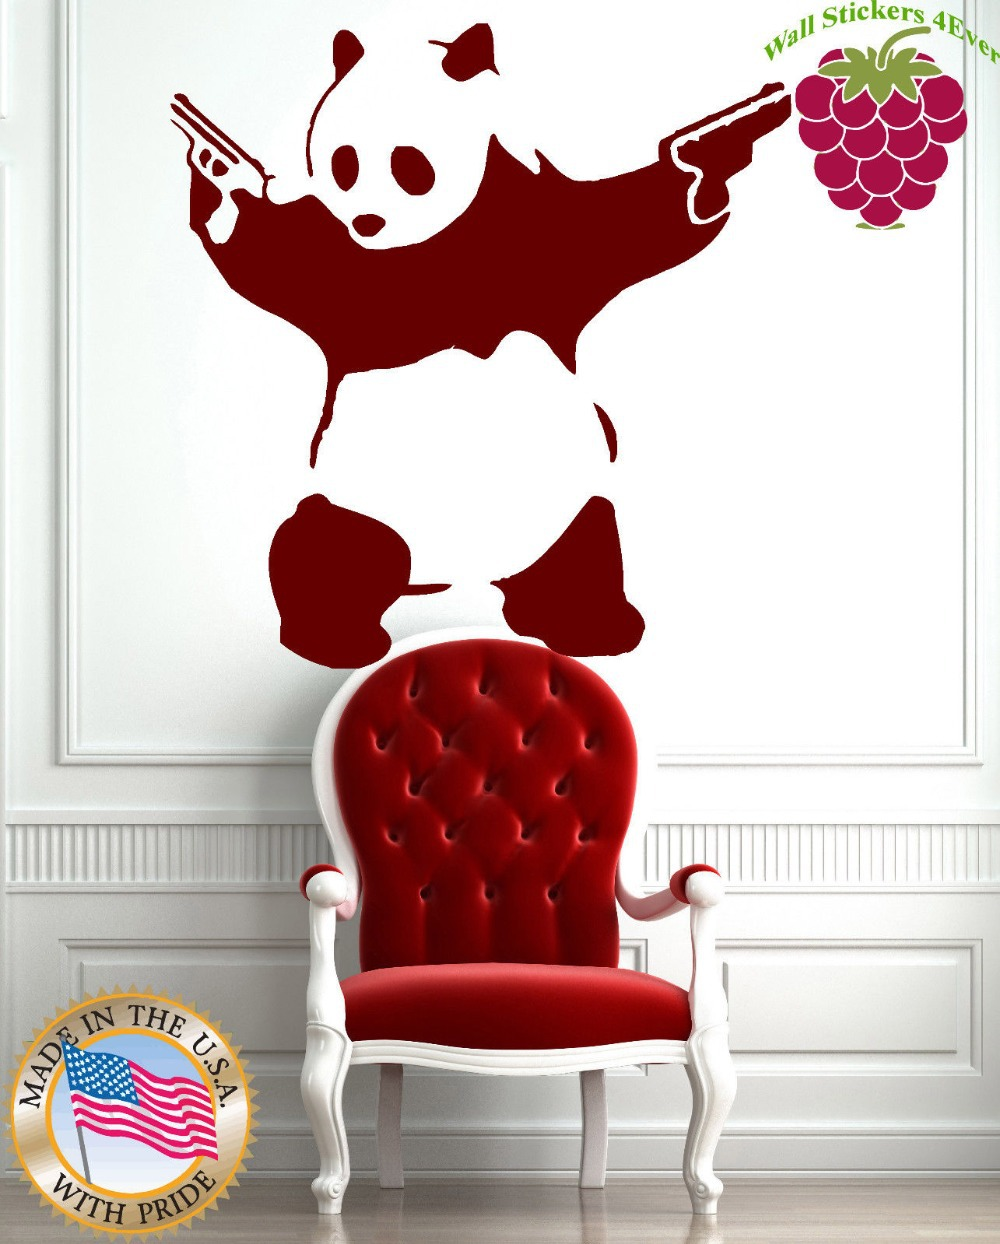 Wall Sticker Vinyl Decal Animal Panda Bear Gangster Guns Funny